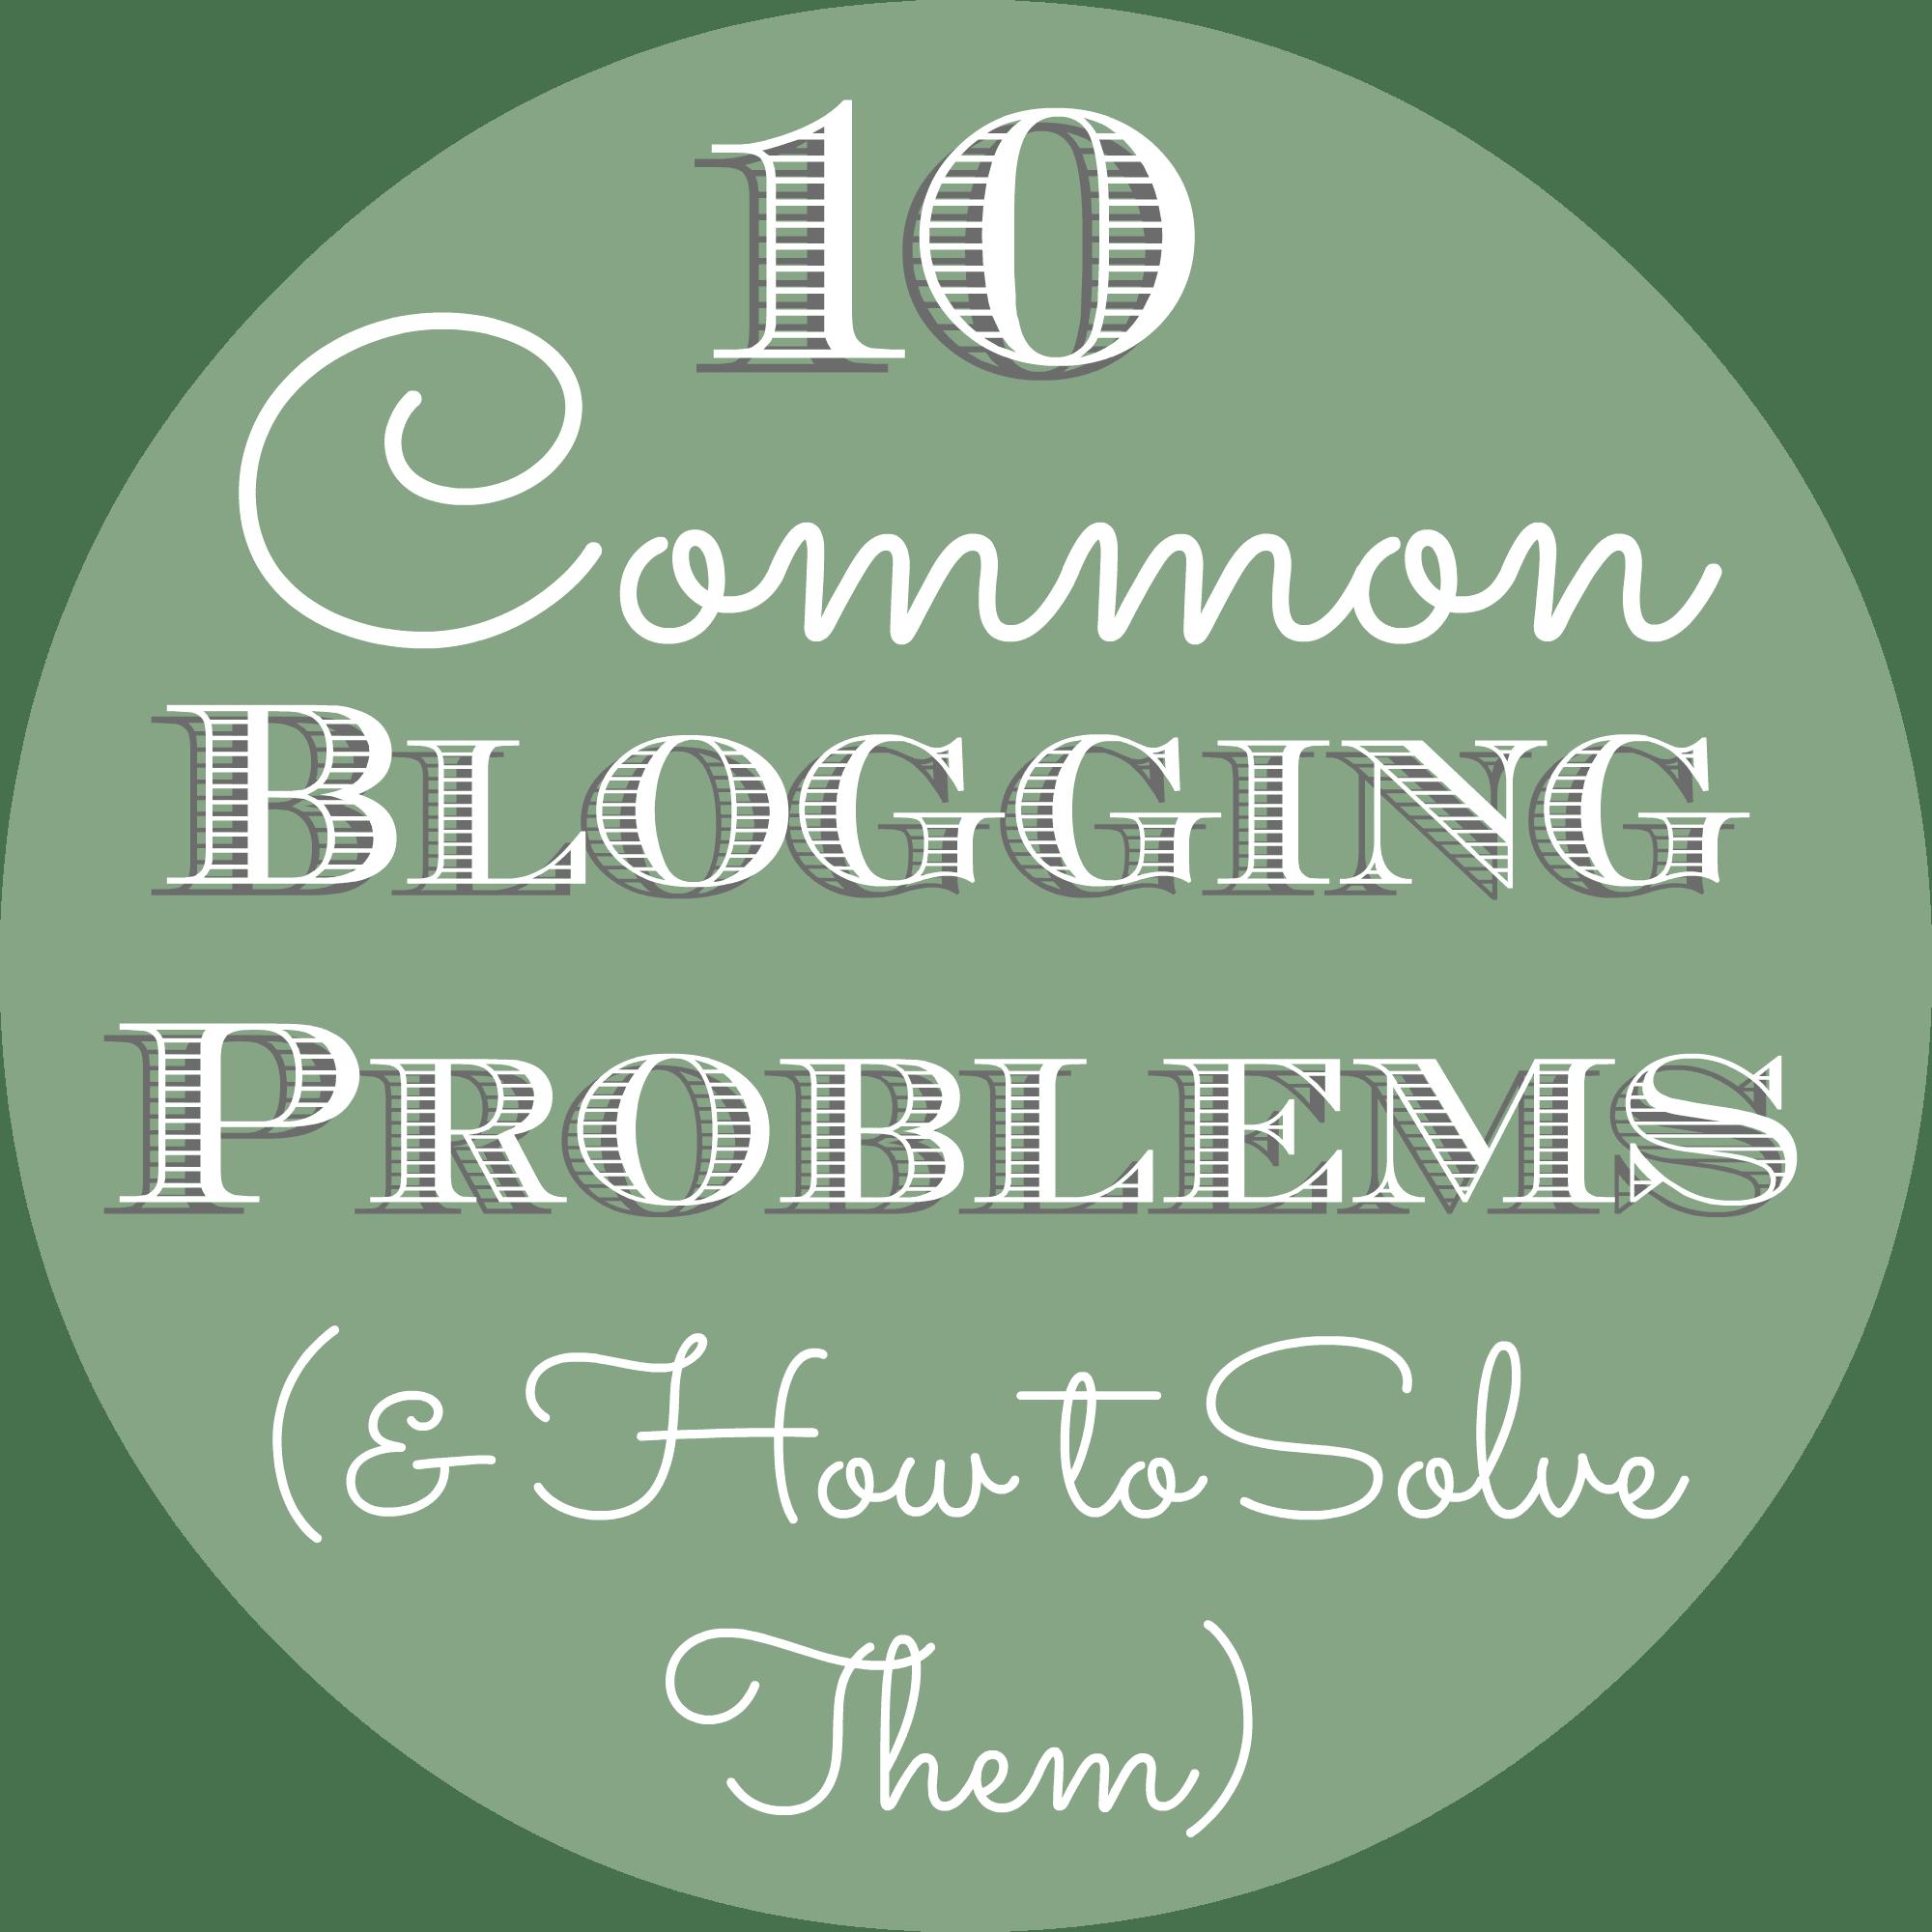 10 common blogging problems